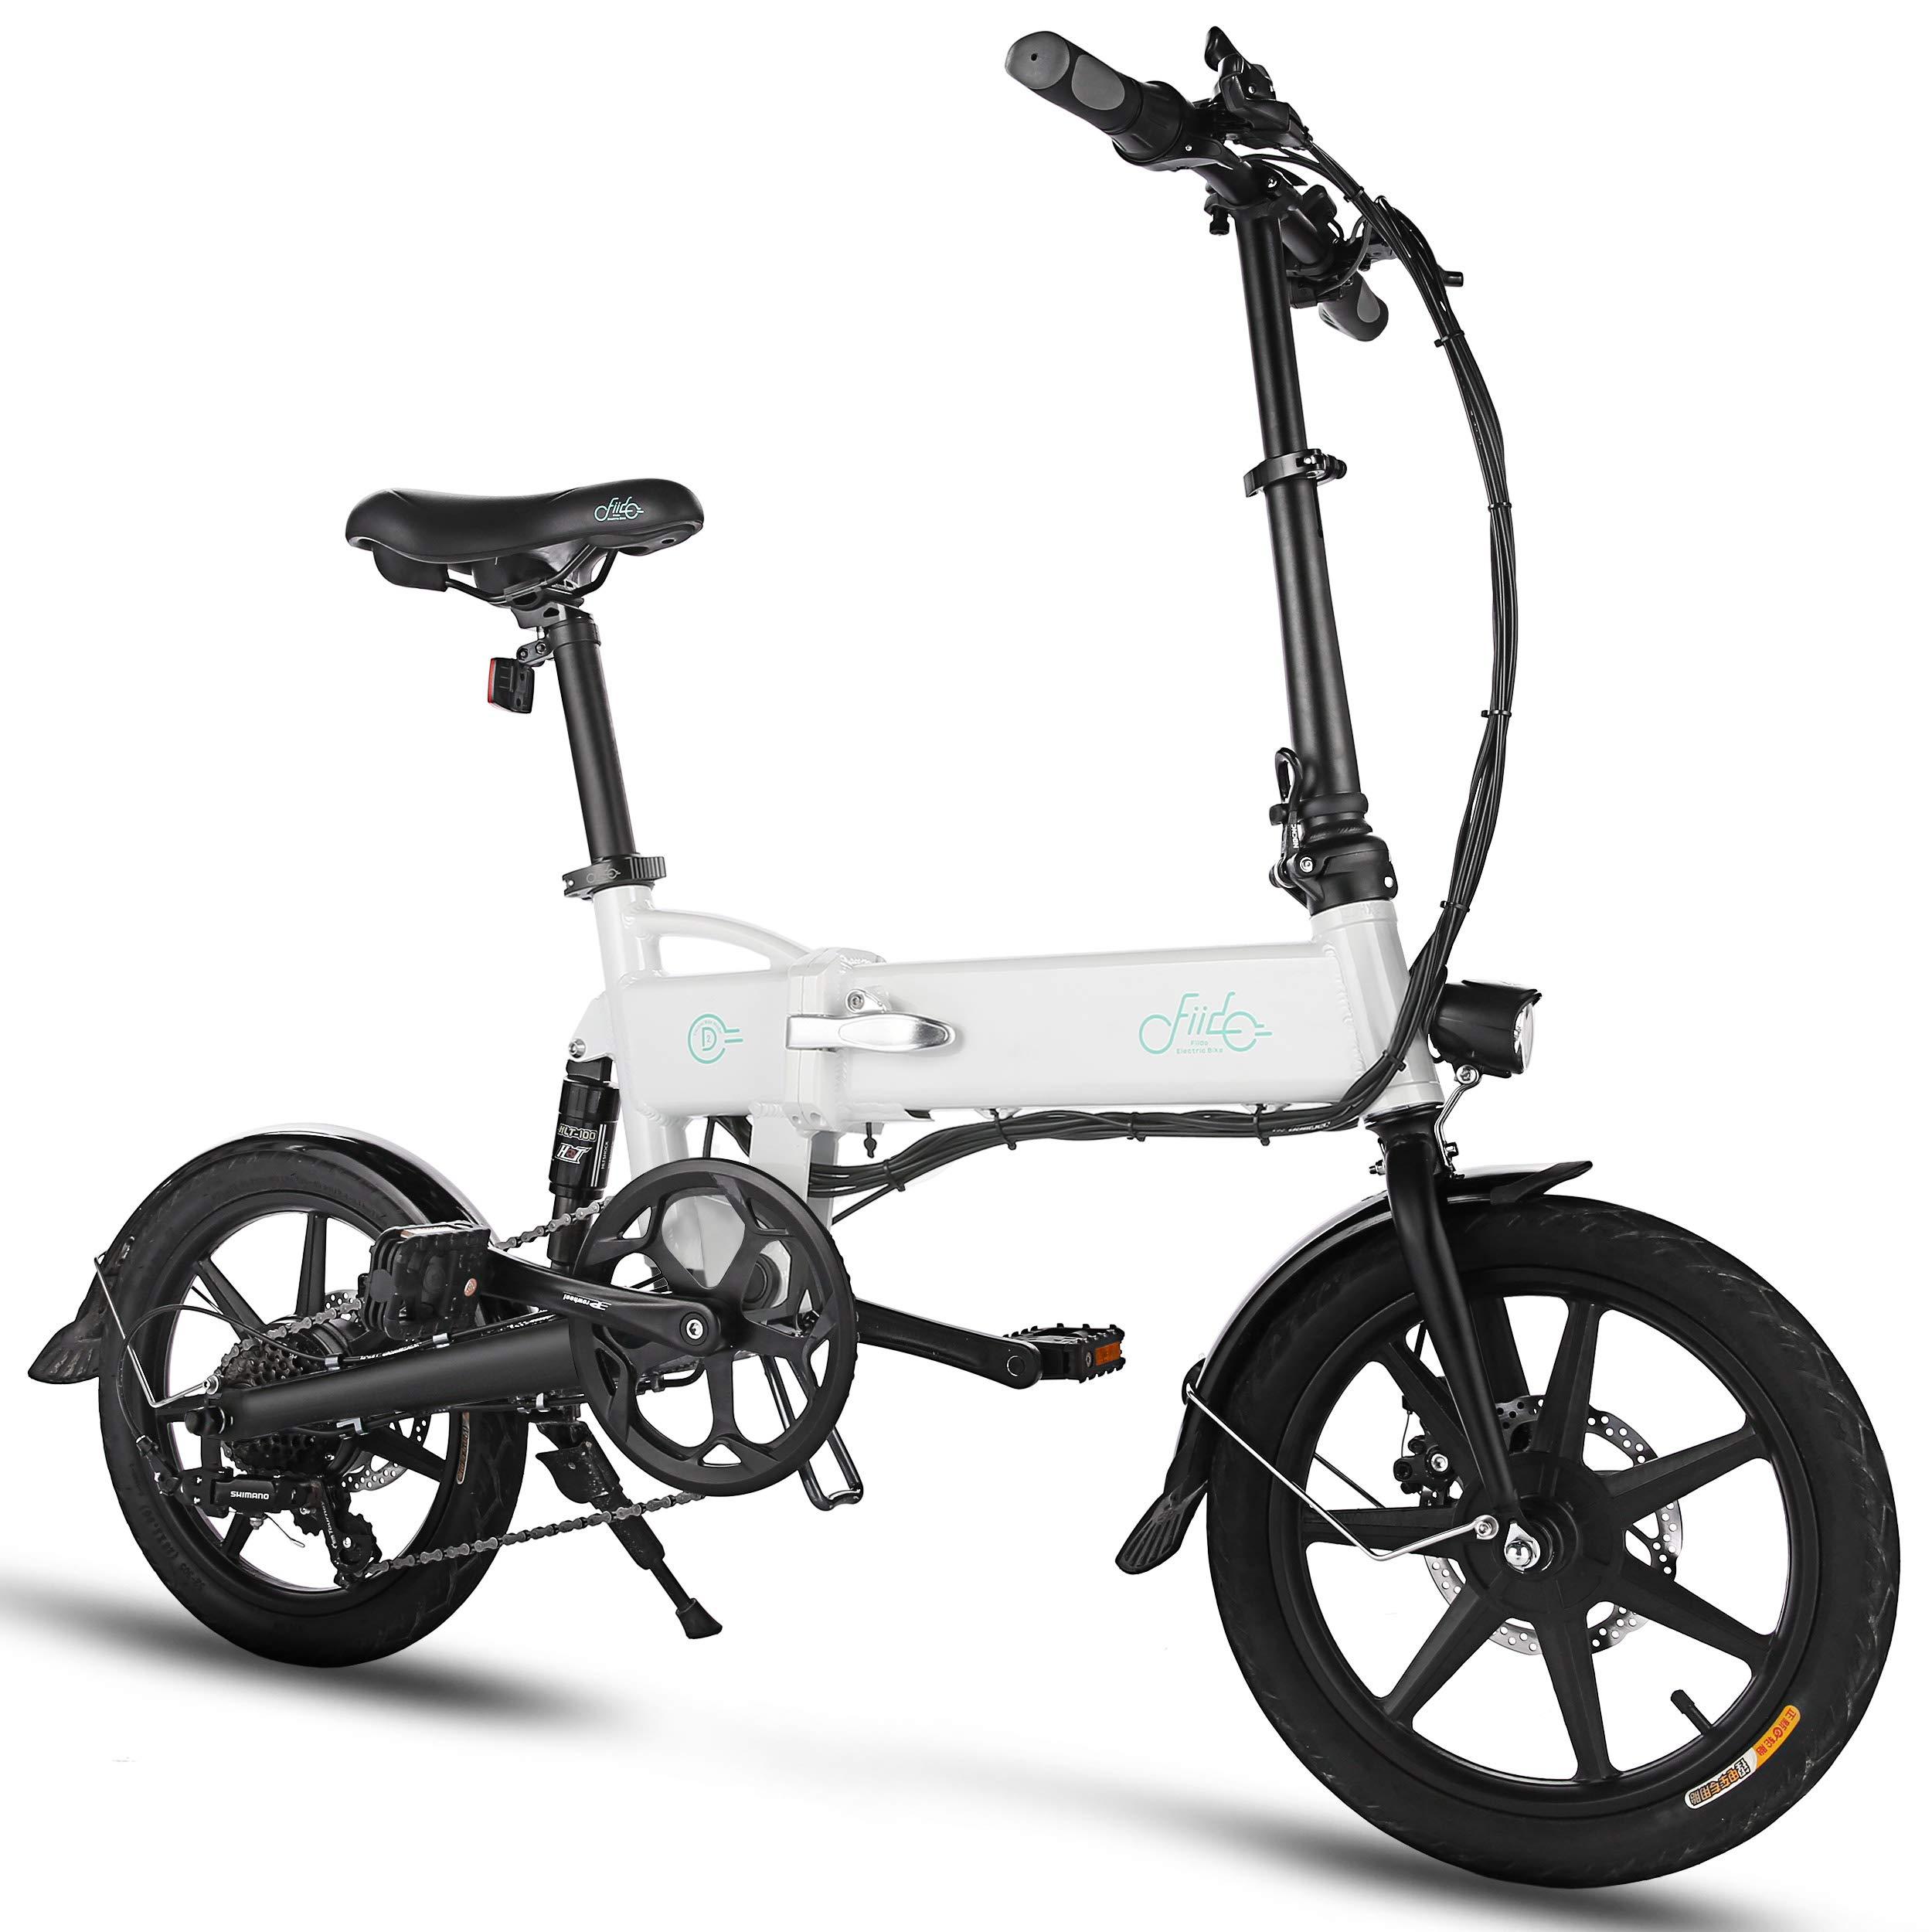 FIIDO Folding EBike, 250W Aluminum Electric Bicycle